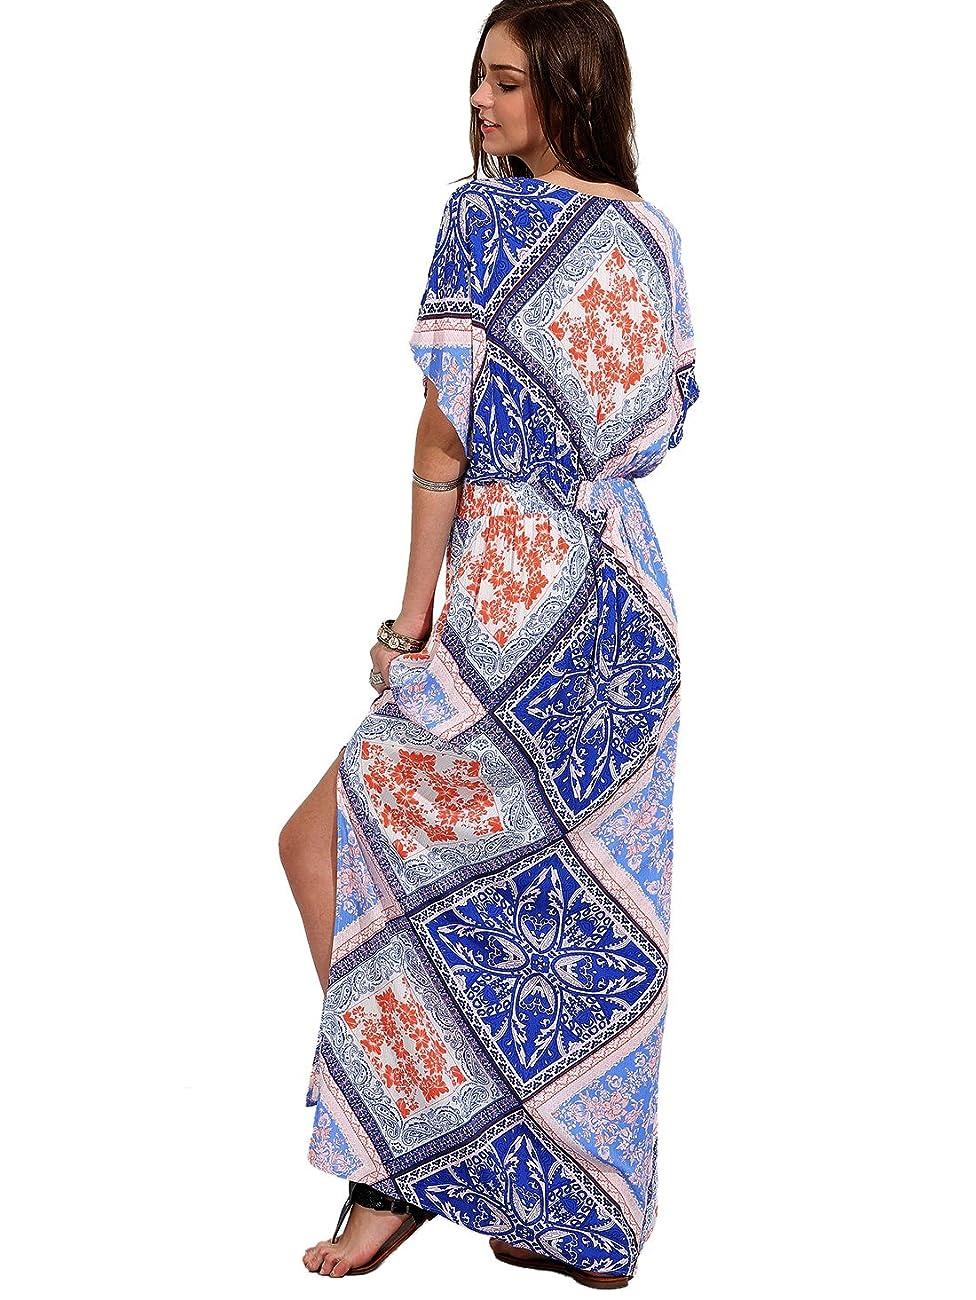 Milumia Women's Boho Split Tie-Waist Vintage Print Maxi Dress 1